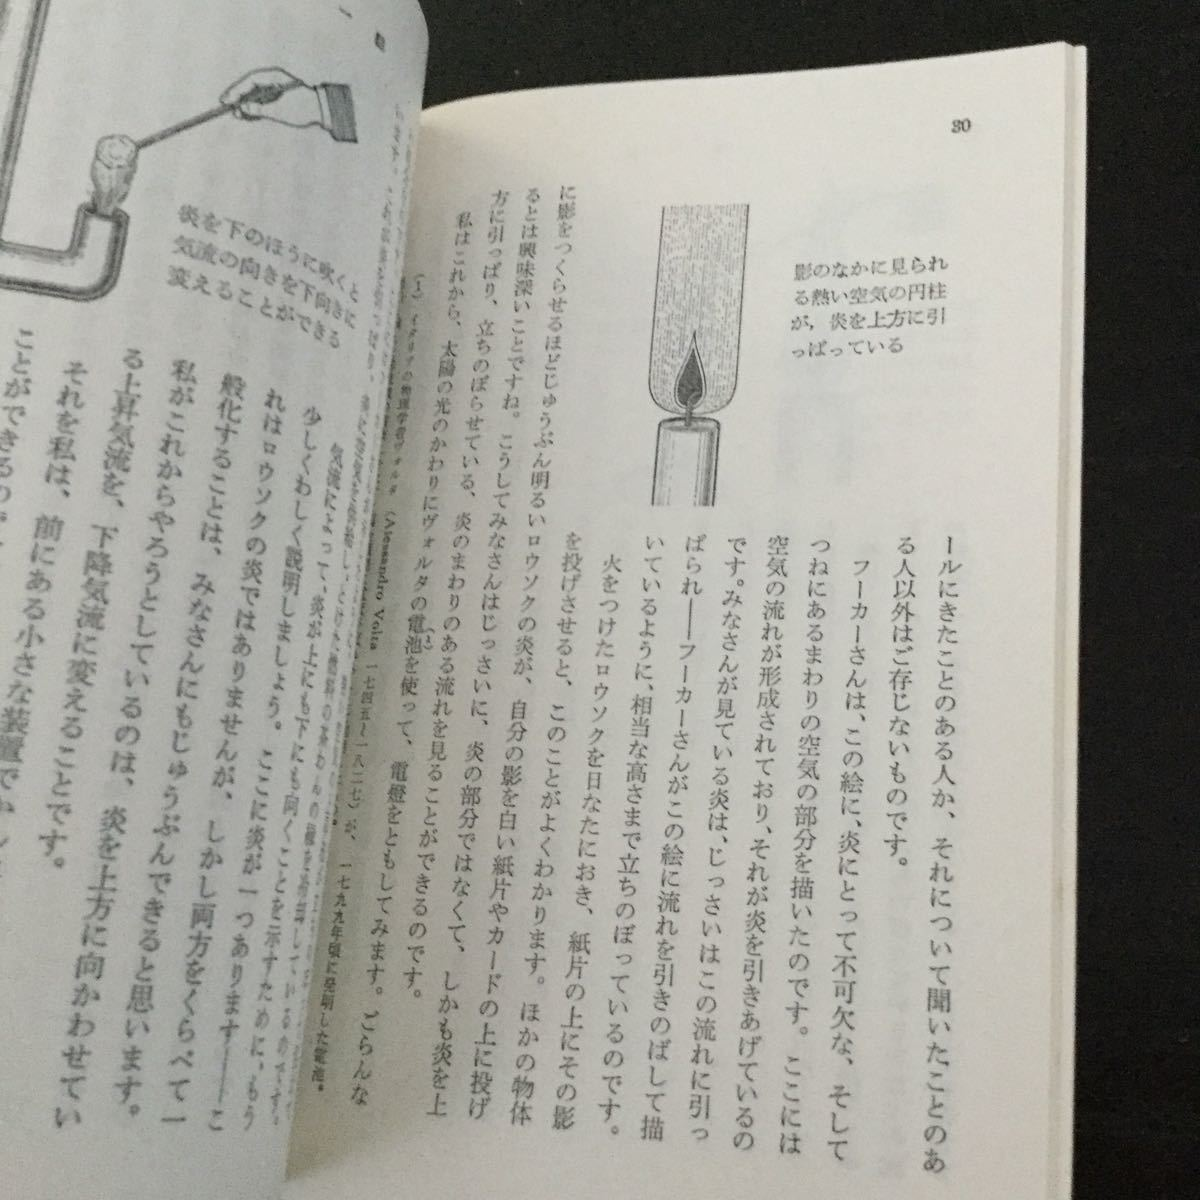 a37 ロウソクの科学 ファラデー 日下実男 小説 旺文社文庫 旺文社 _画像6